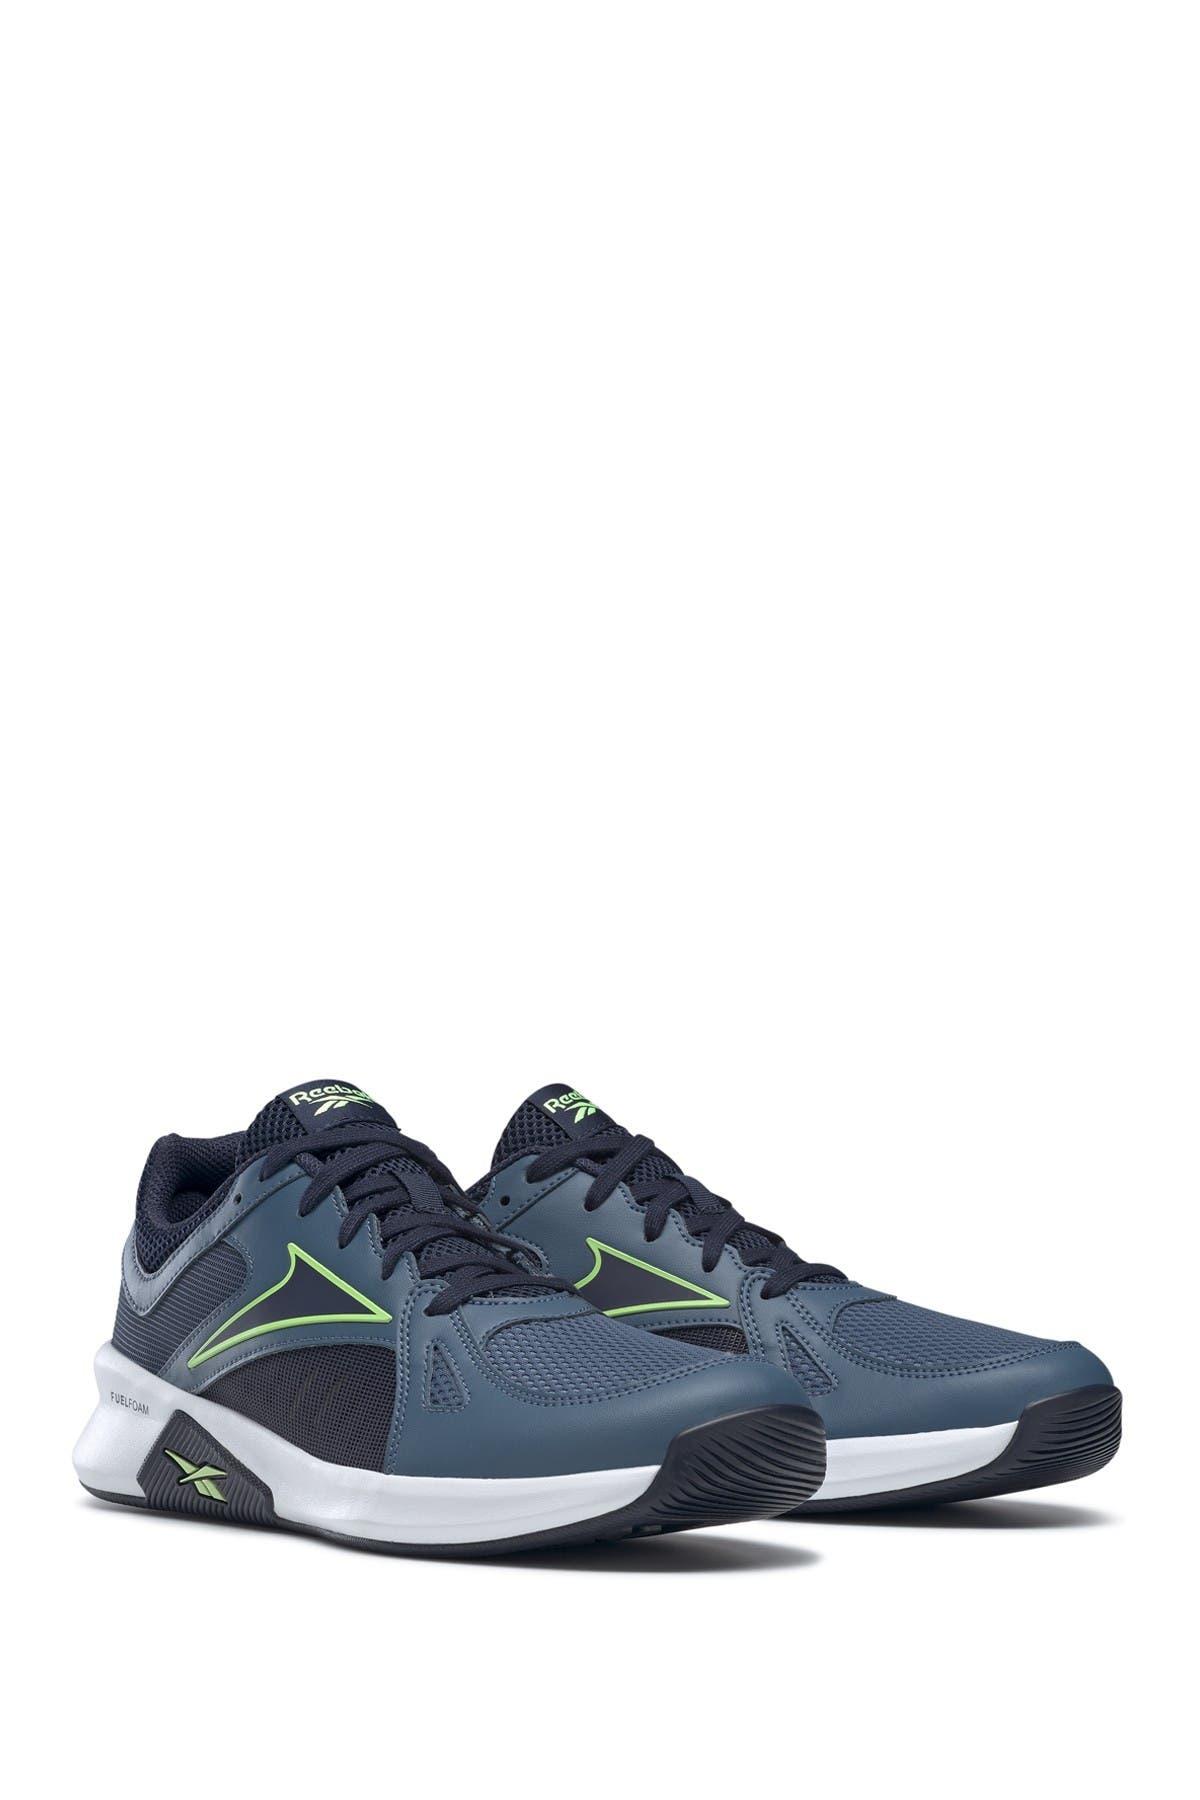 Image of Reebok Advanced Trainer Shoe